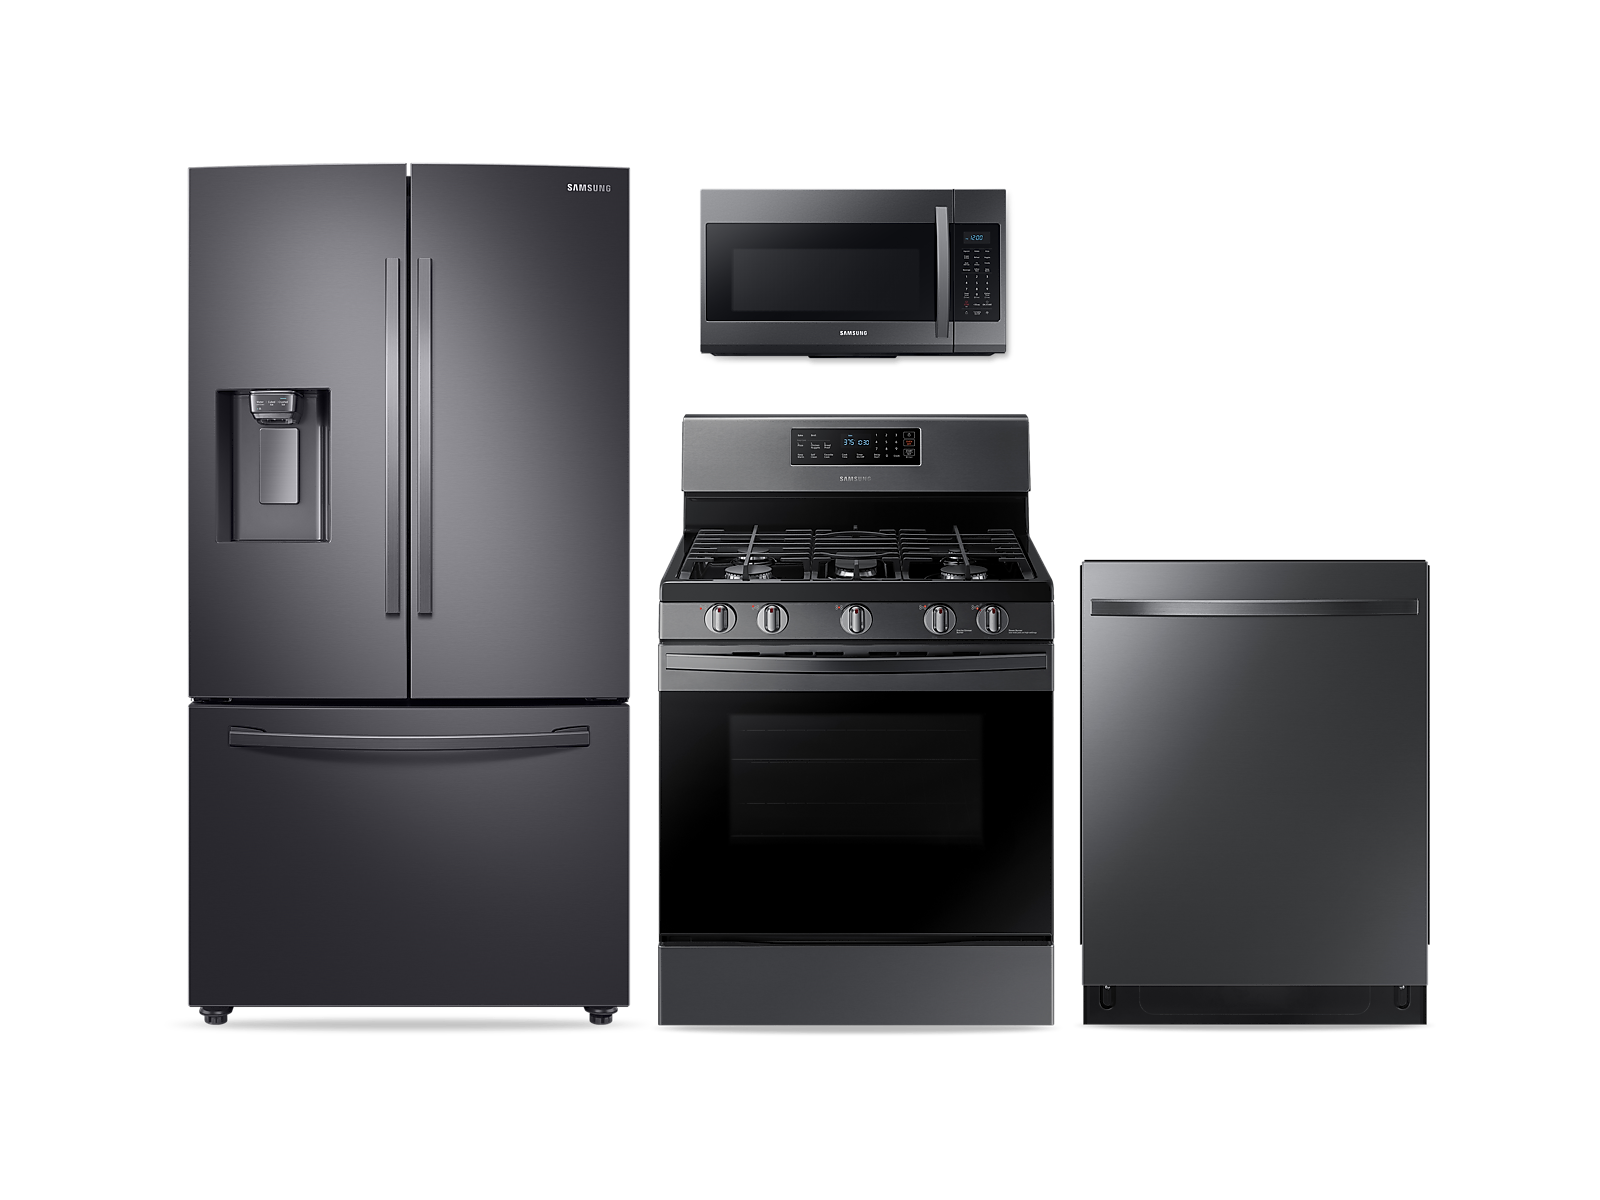 Samsung coupon: Samsung Large Capacity 3-door Refrigerator + Gas Range + StormWash Dishwasher + Microwave Kitchen Package in Black Stainless(BNDL-1572441513414)